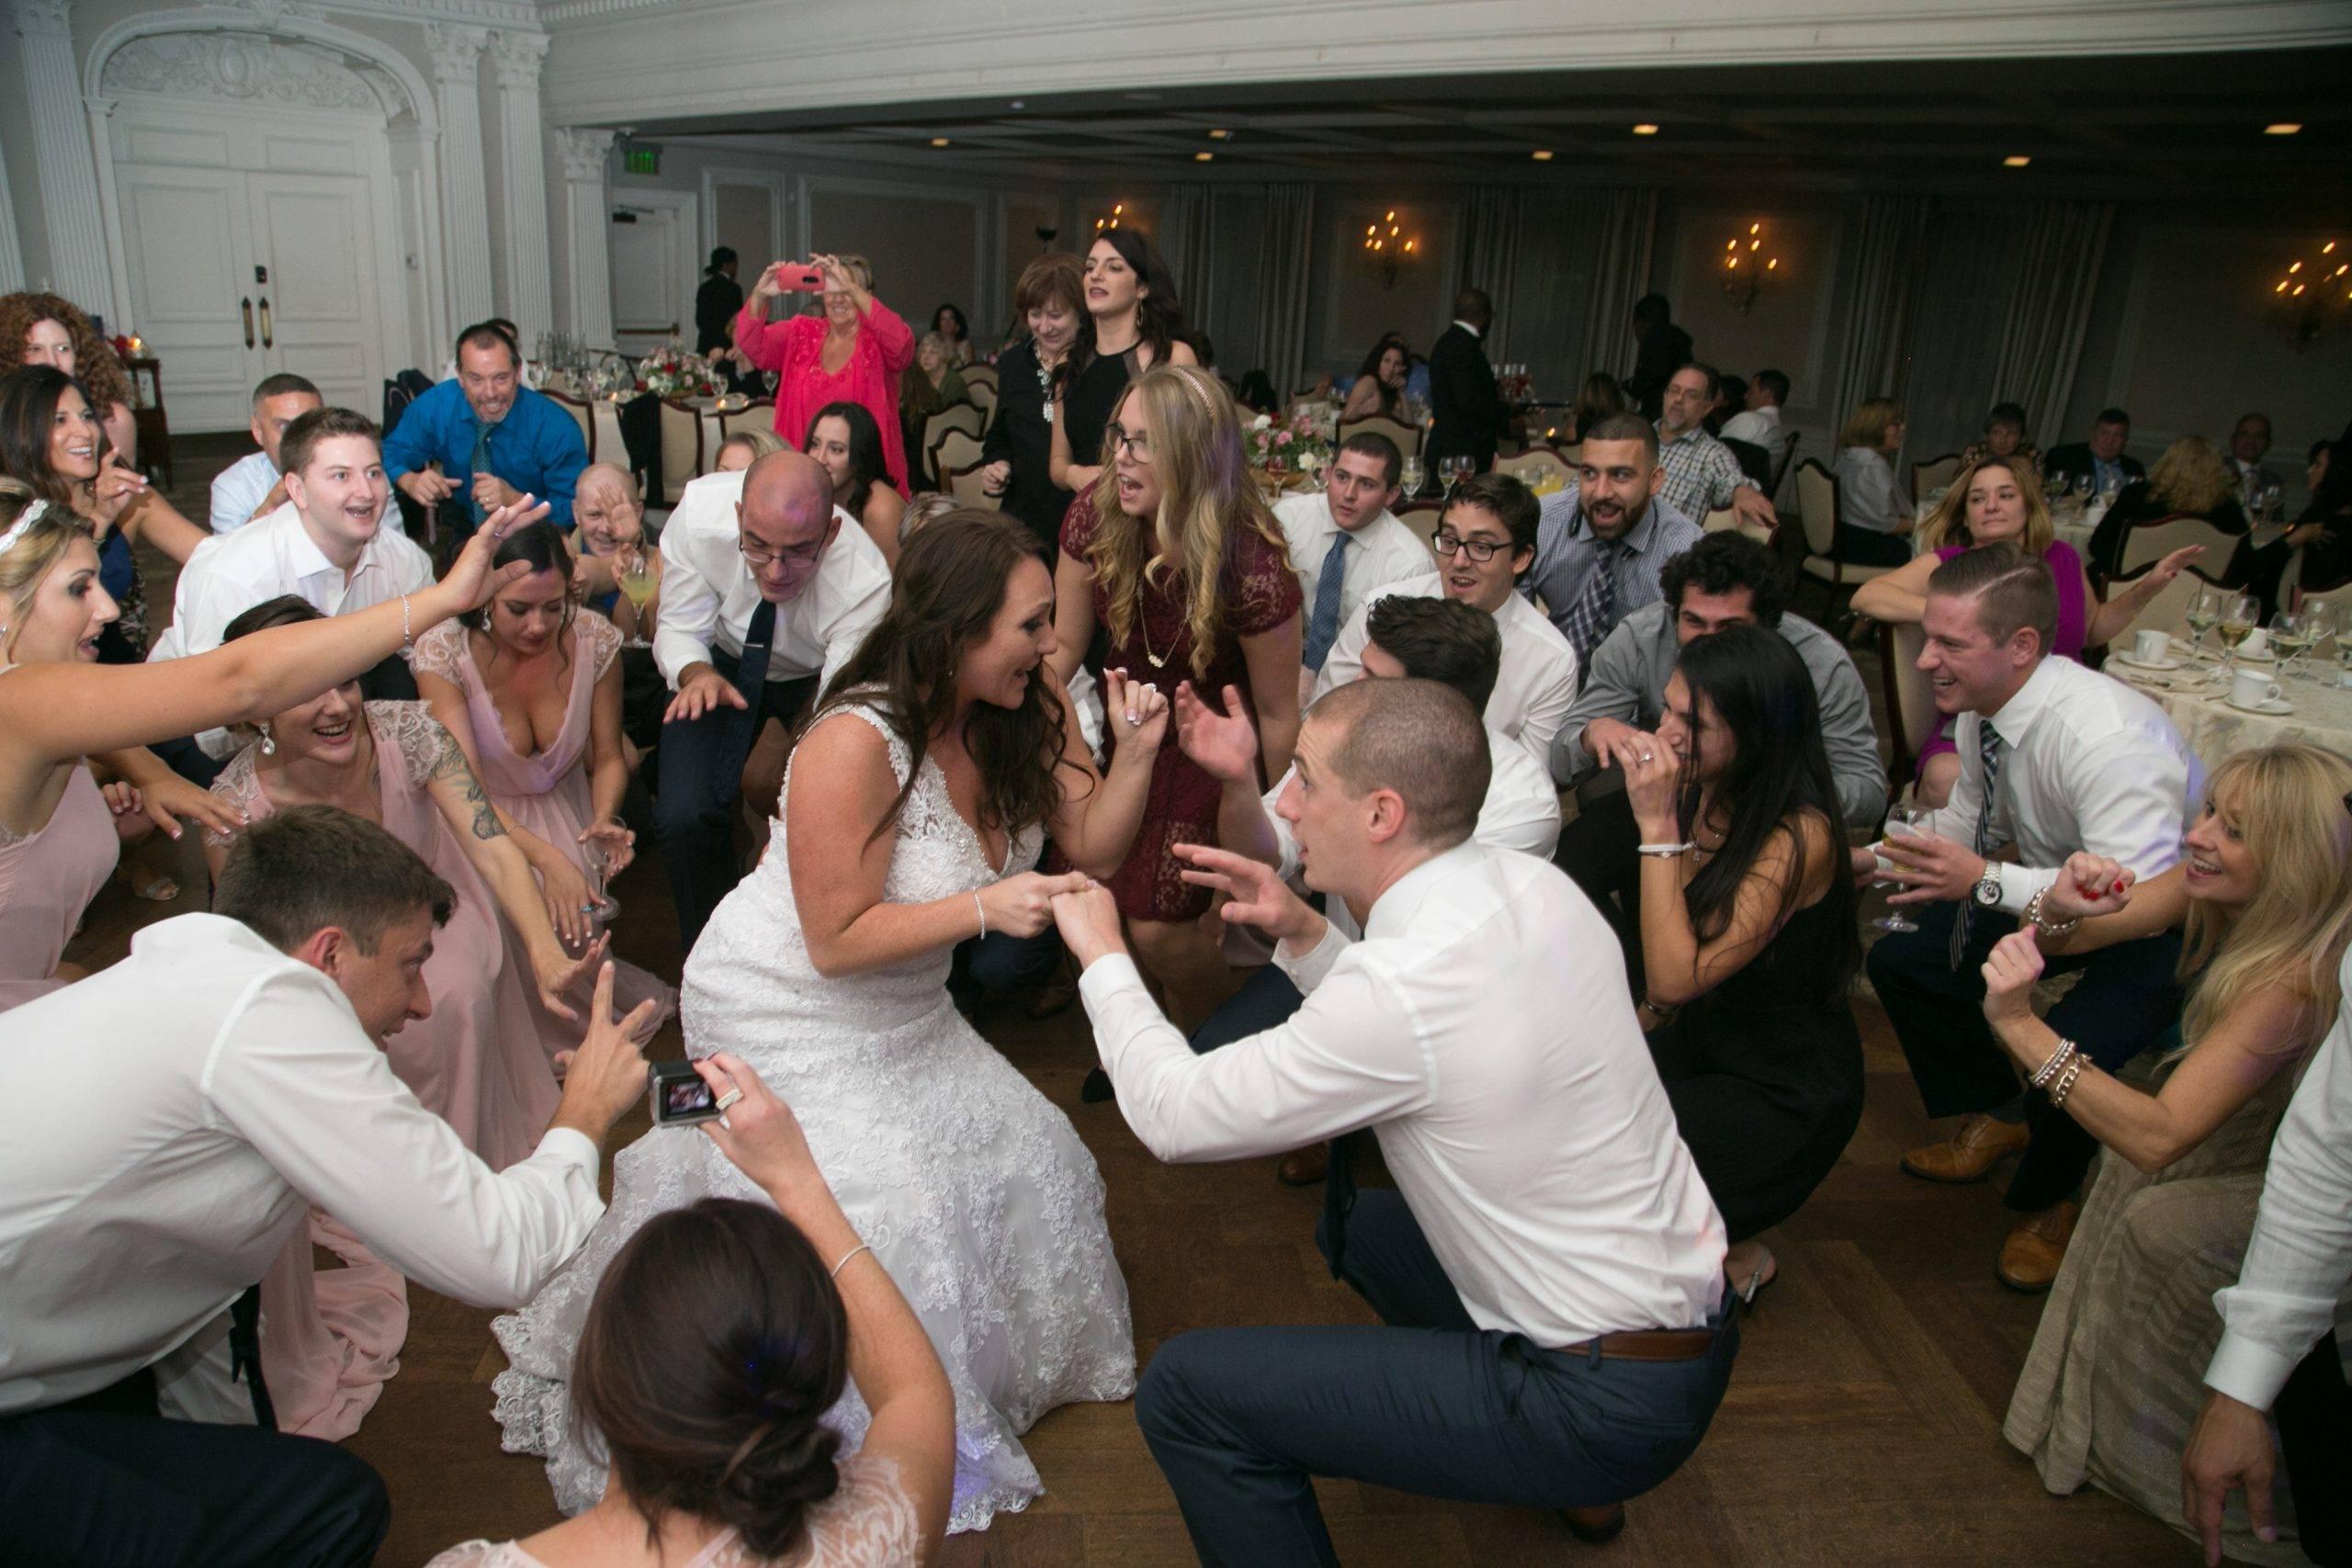 Park Savoy bride and groom dancing at their wedding